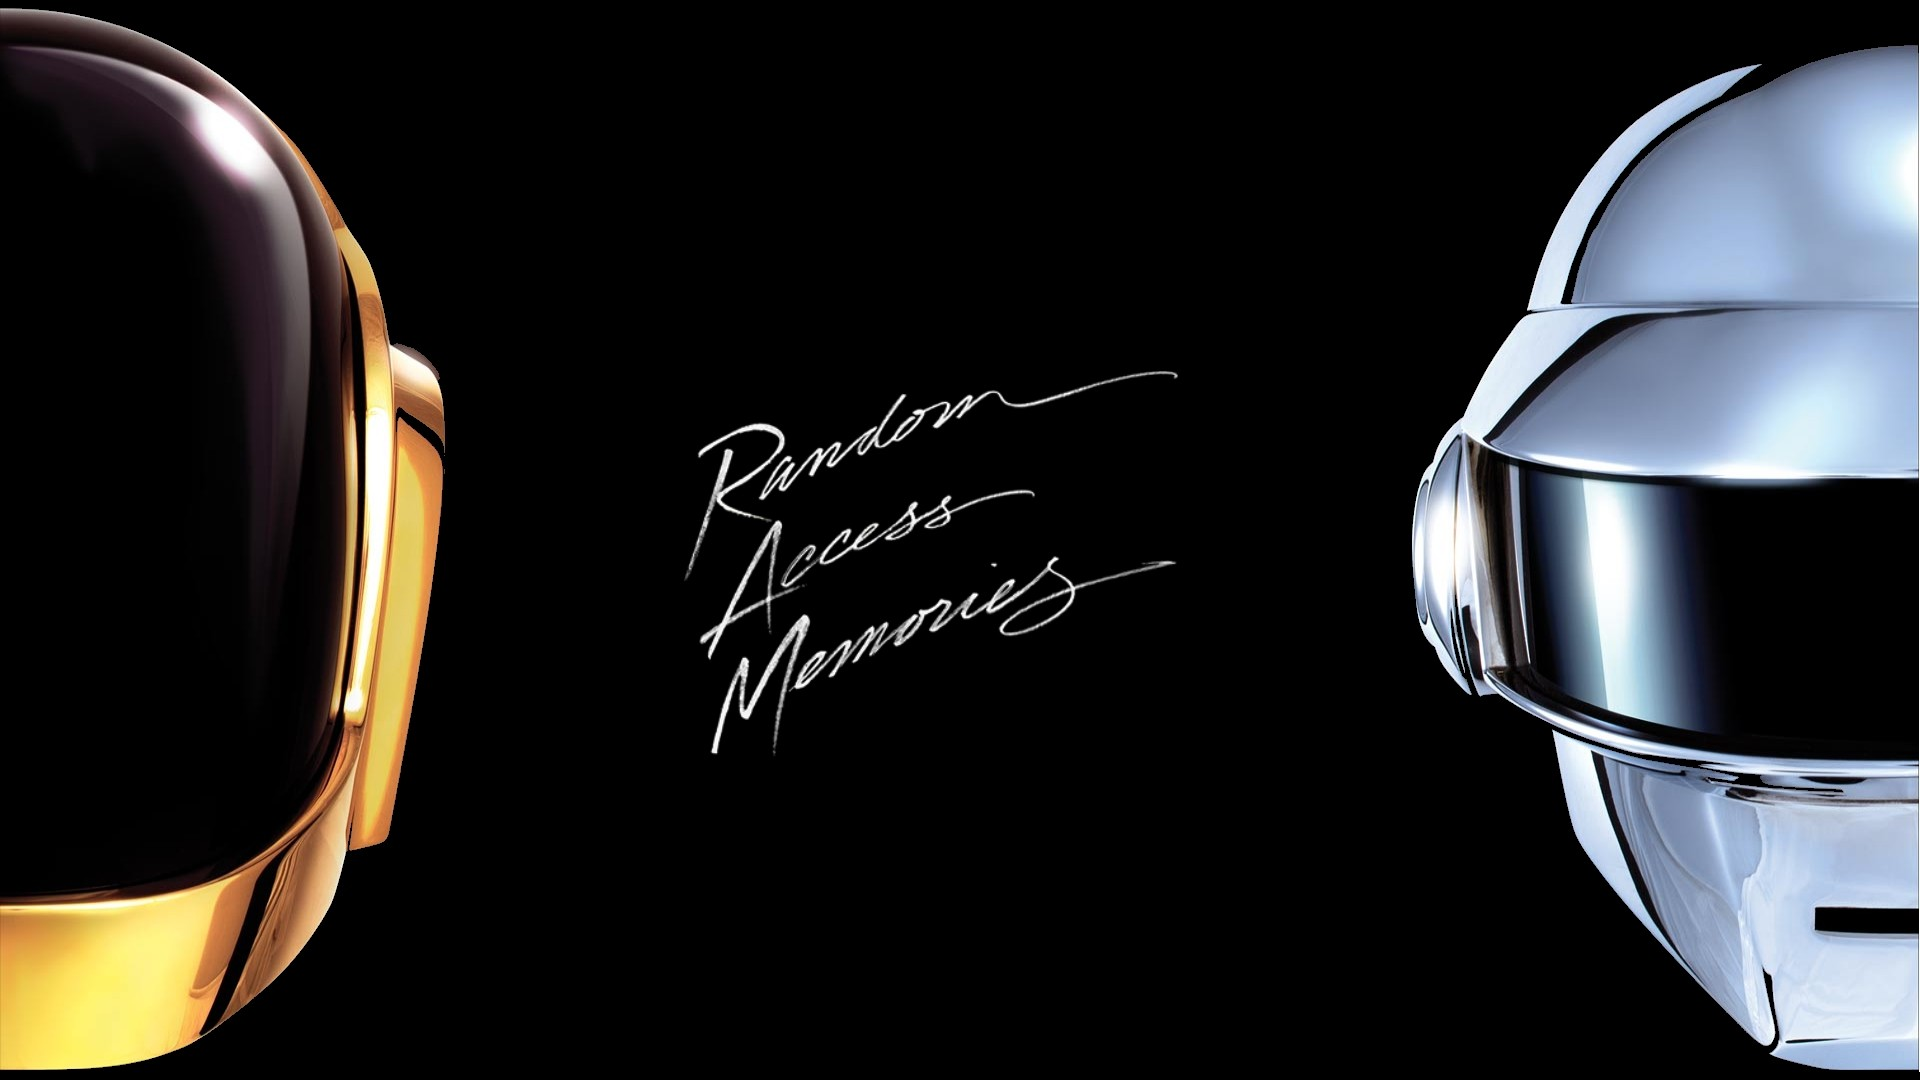 Daft Punk - Random Access Memories HD Wallpaper ...